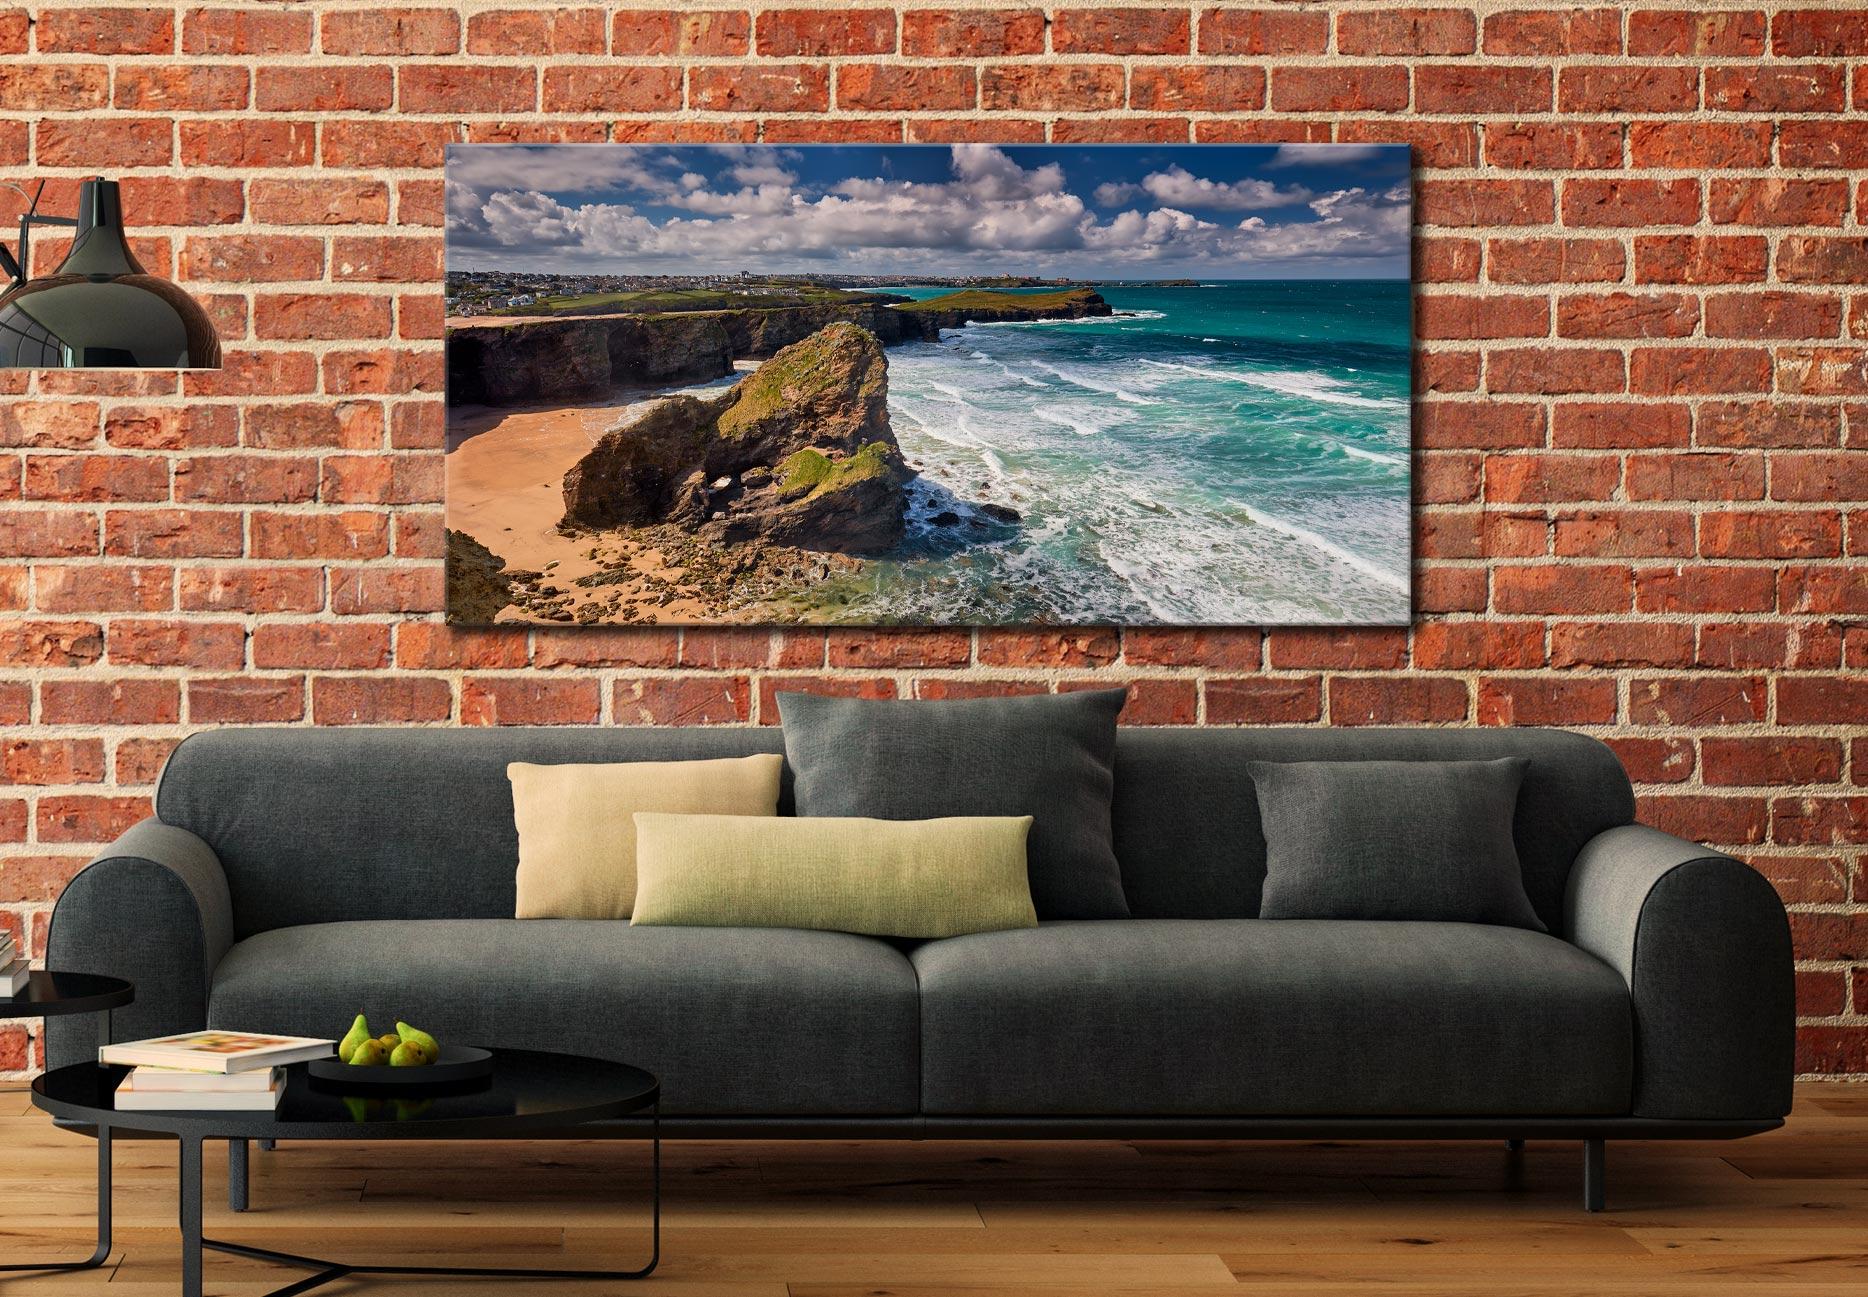 Black Humprey Rock - Canvas Print on Wall